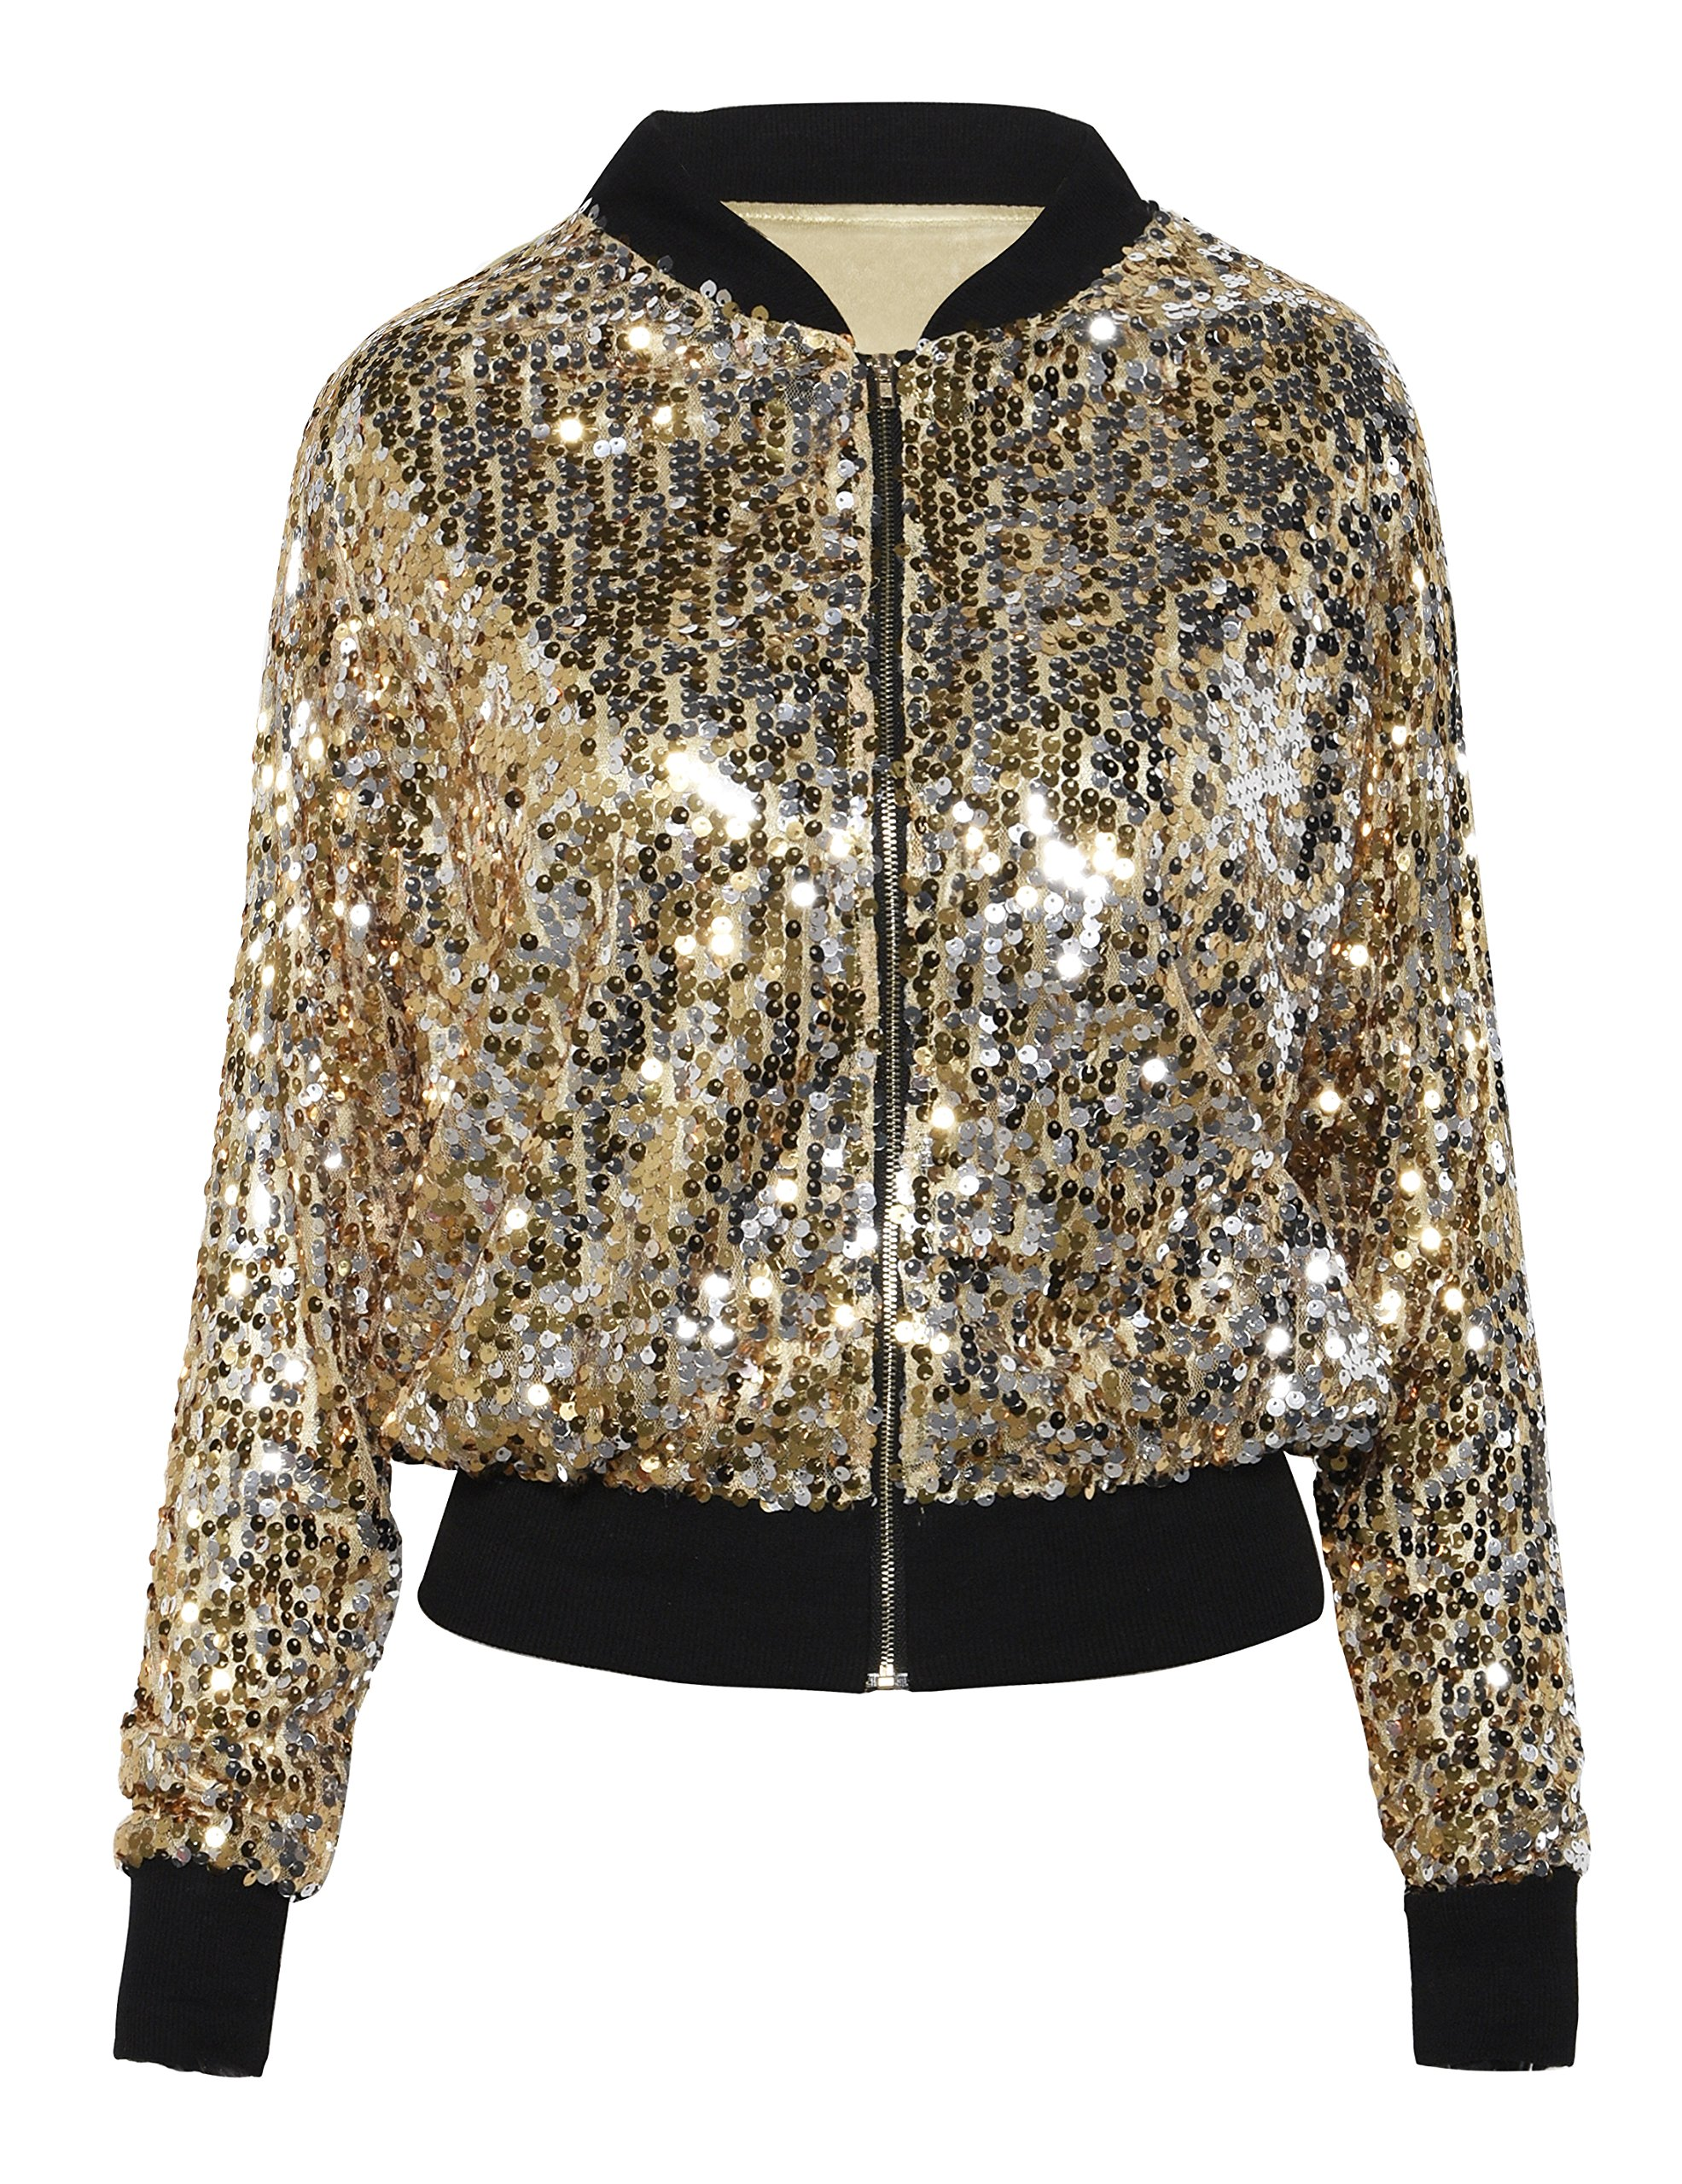 PrettyGuide Women's Sequin Top Lightweight Cardigan Bomber Jacket Outwear L/8-10 Gold